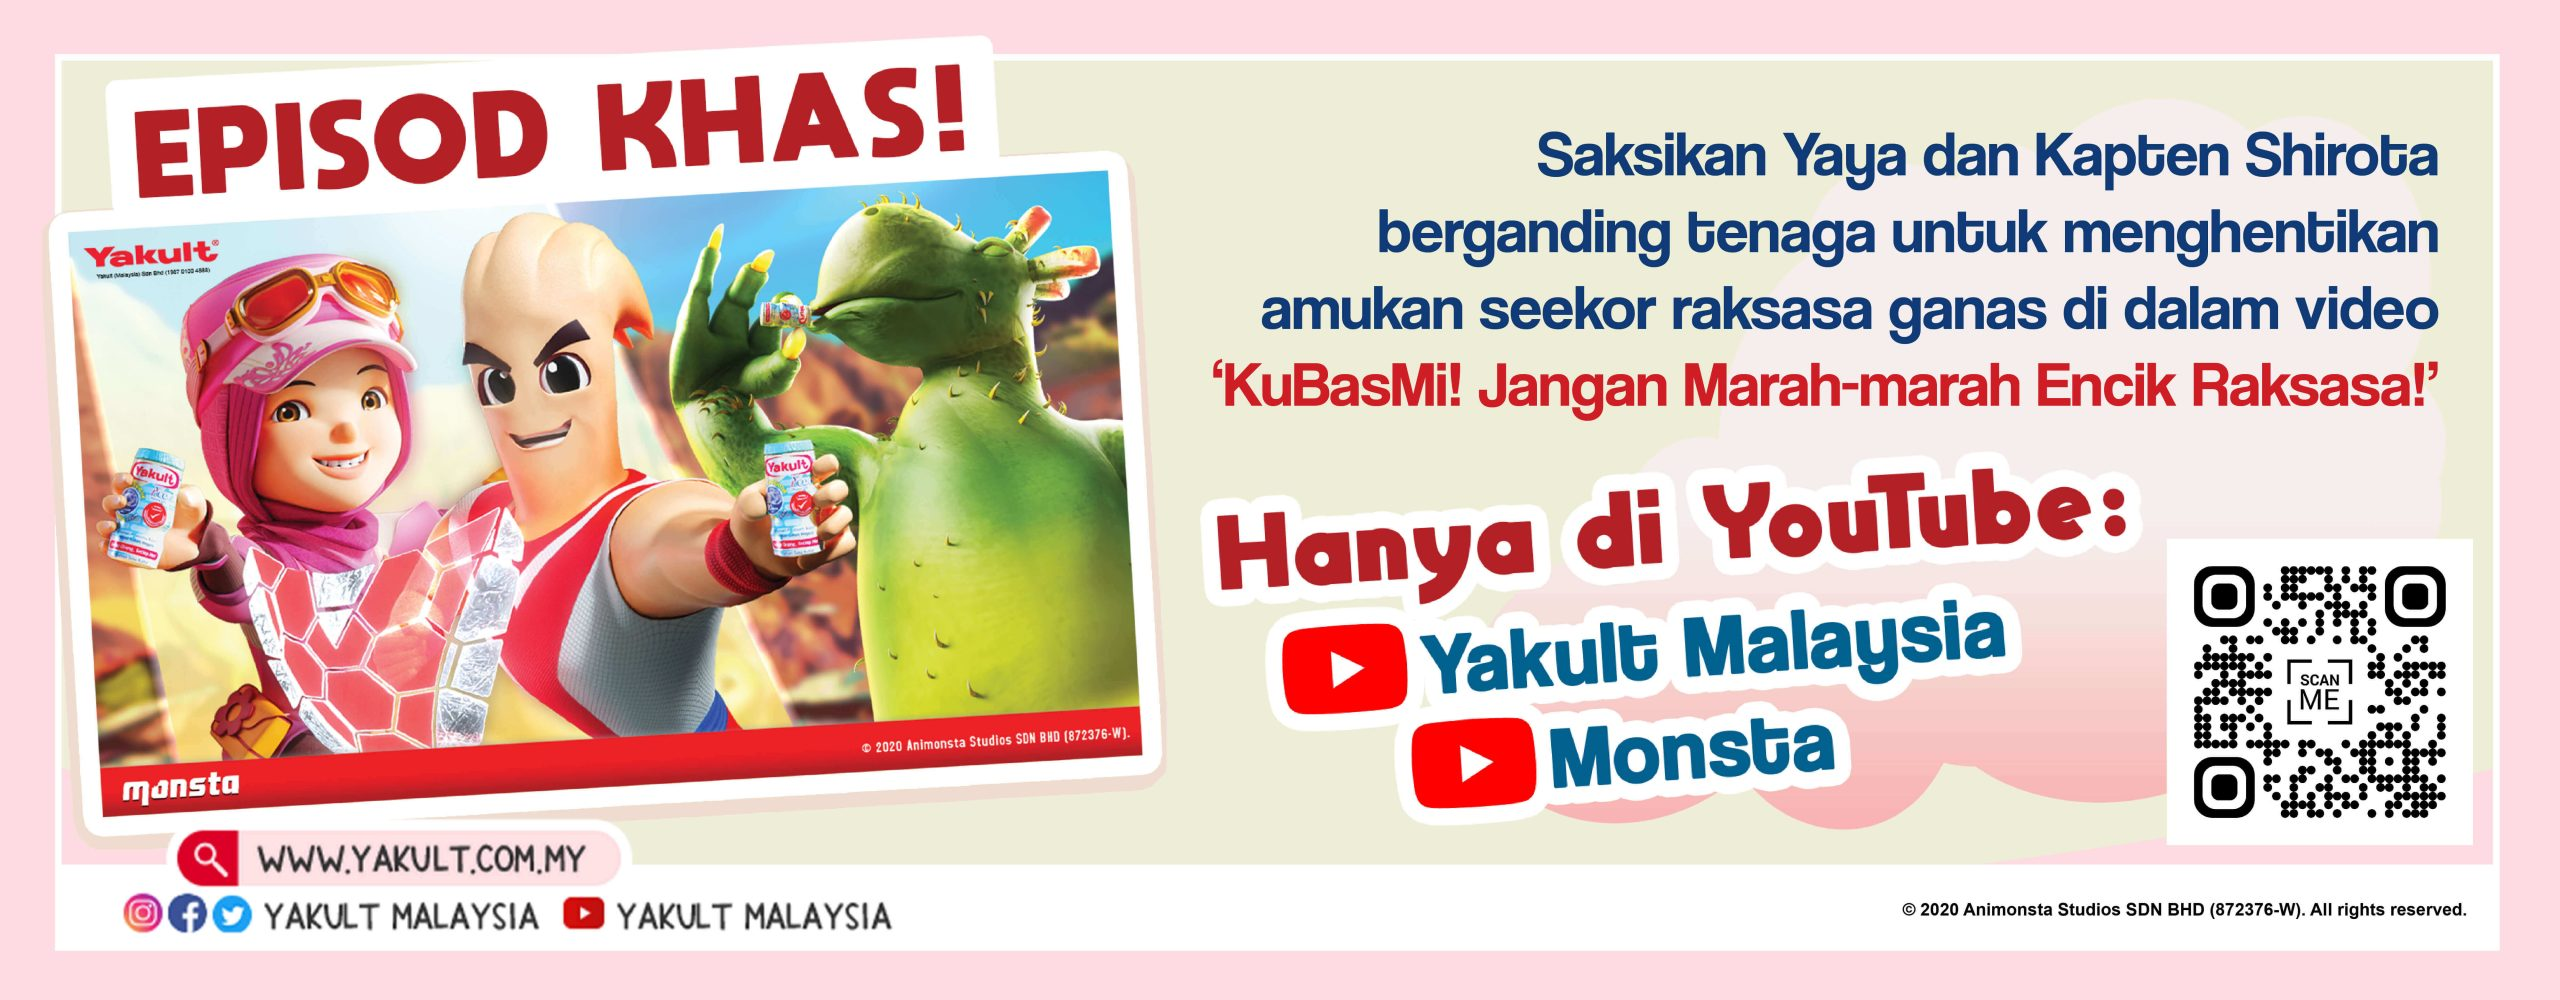 probiotic malaysia